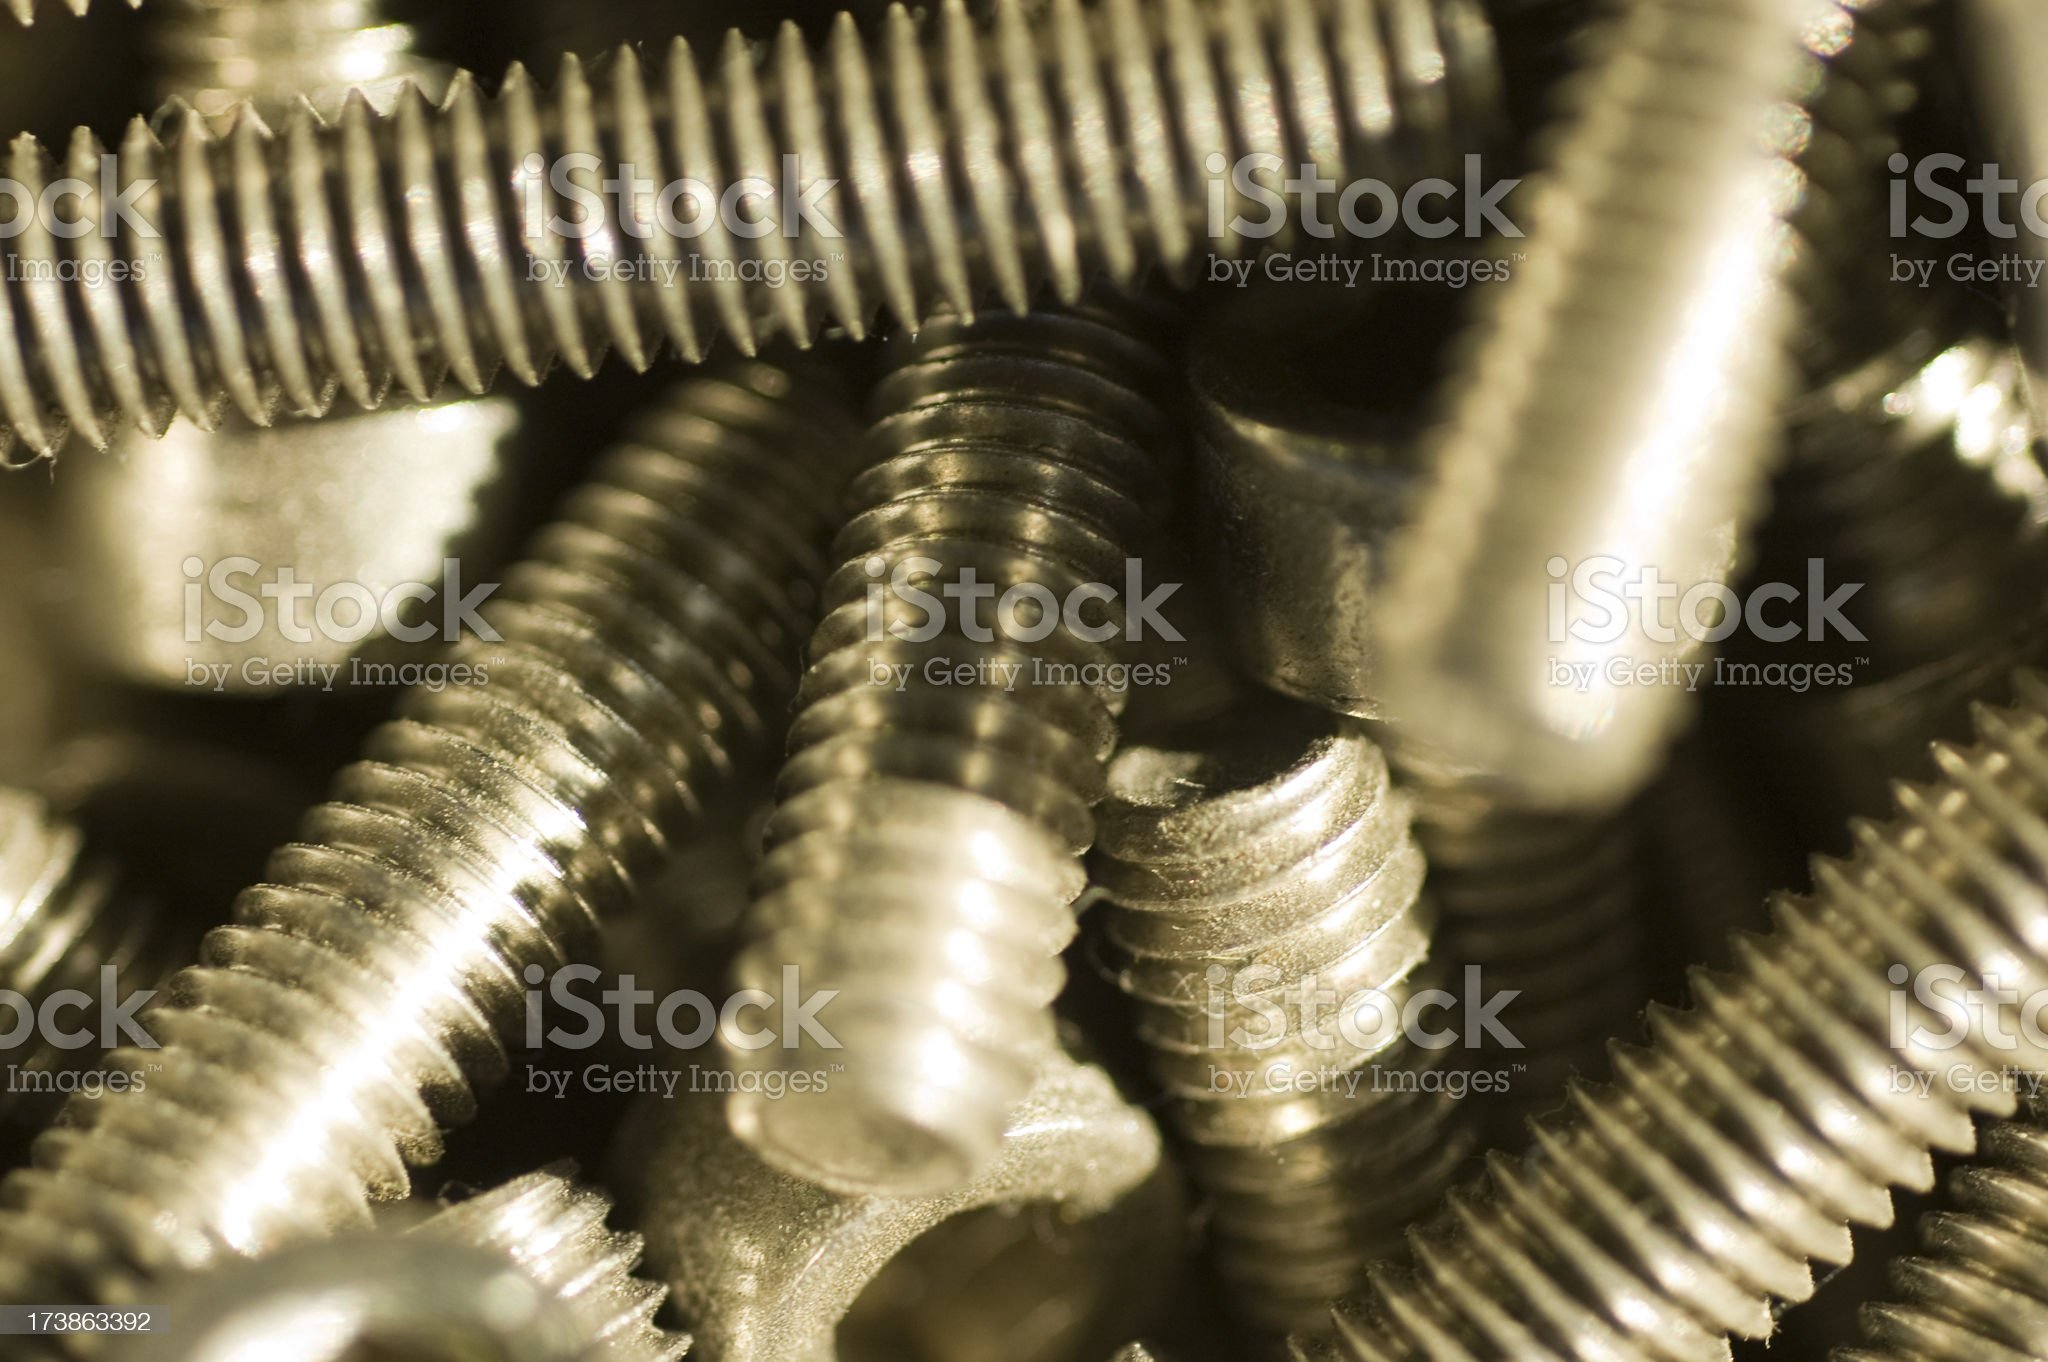 screws royalty-free stock photo